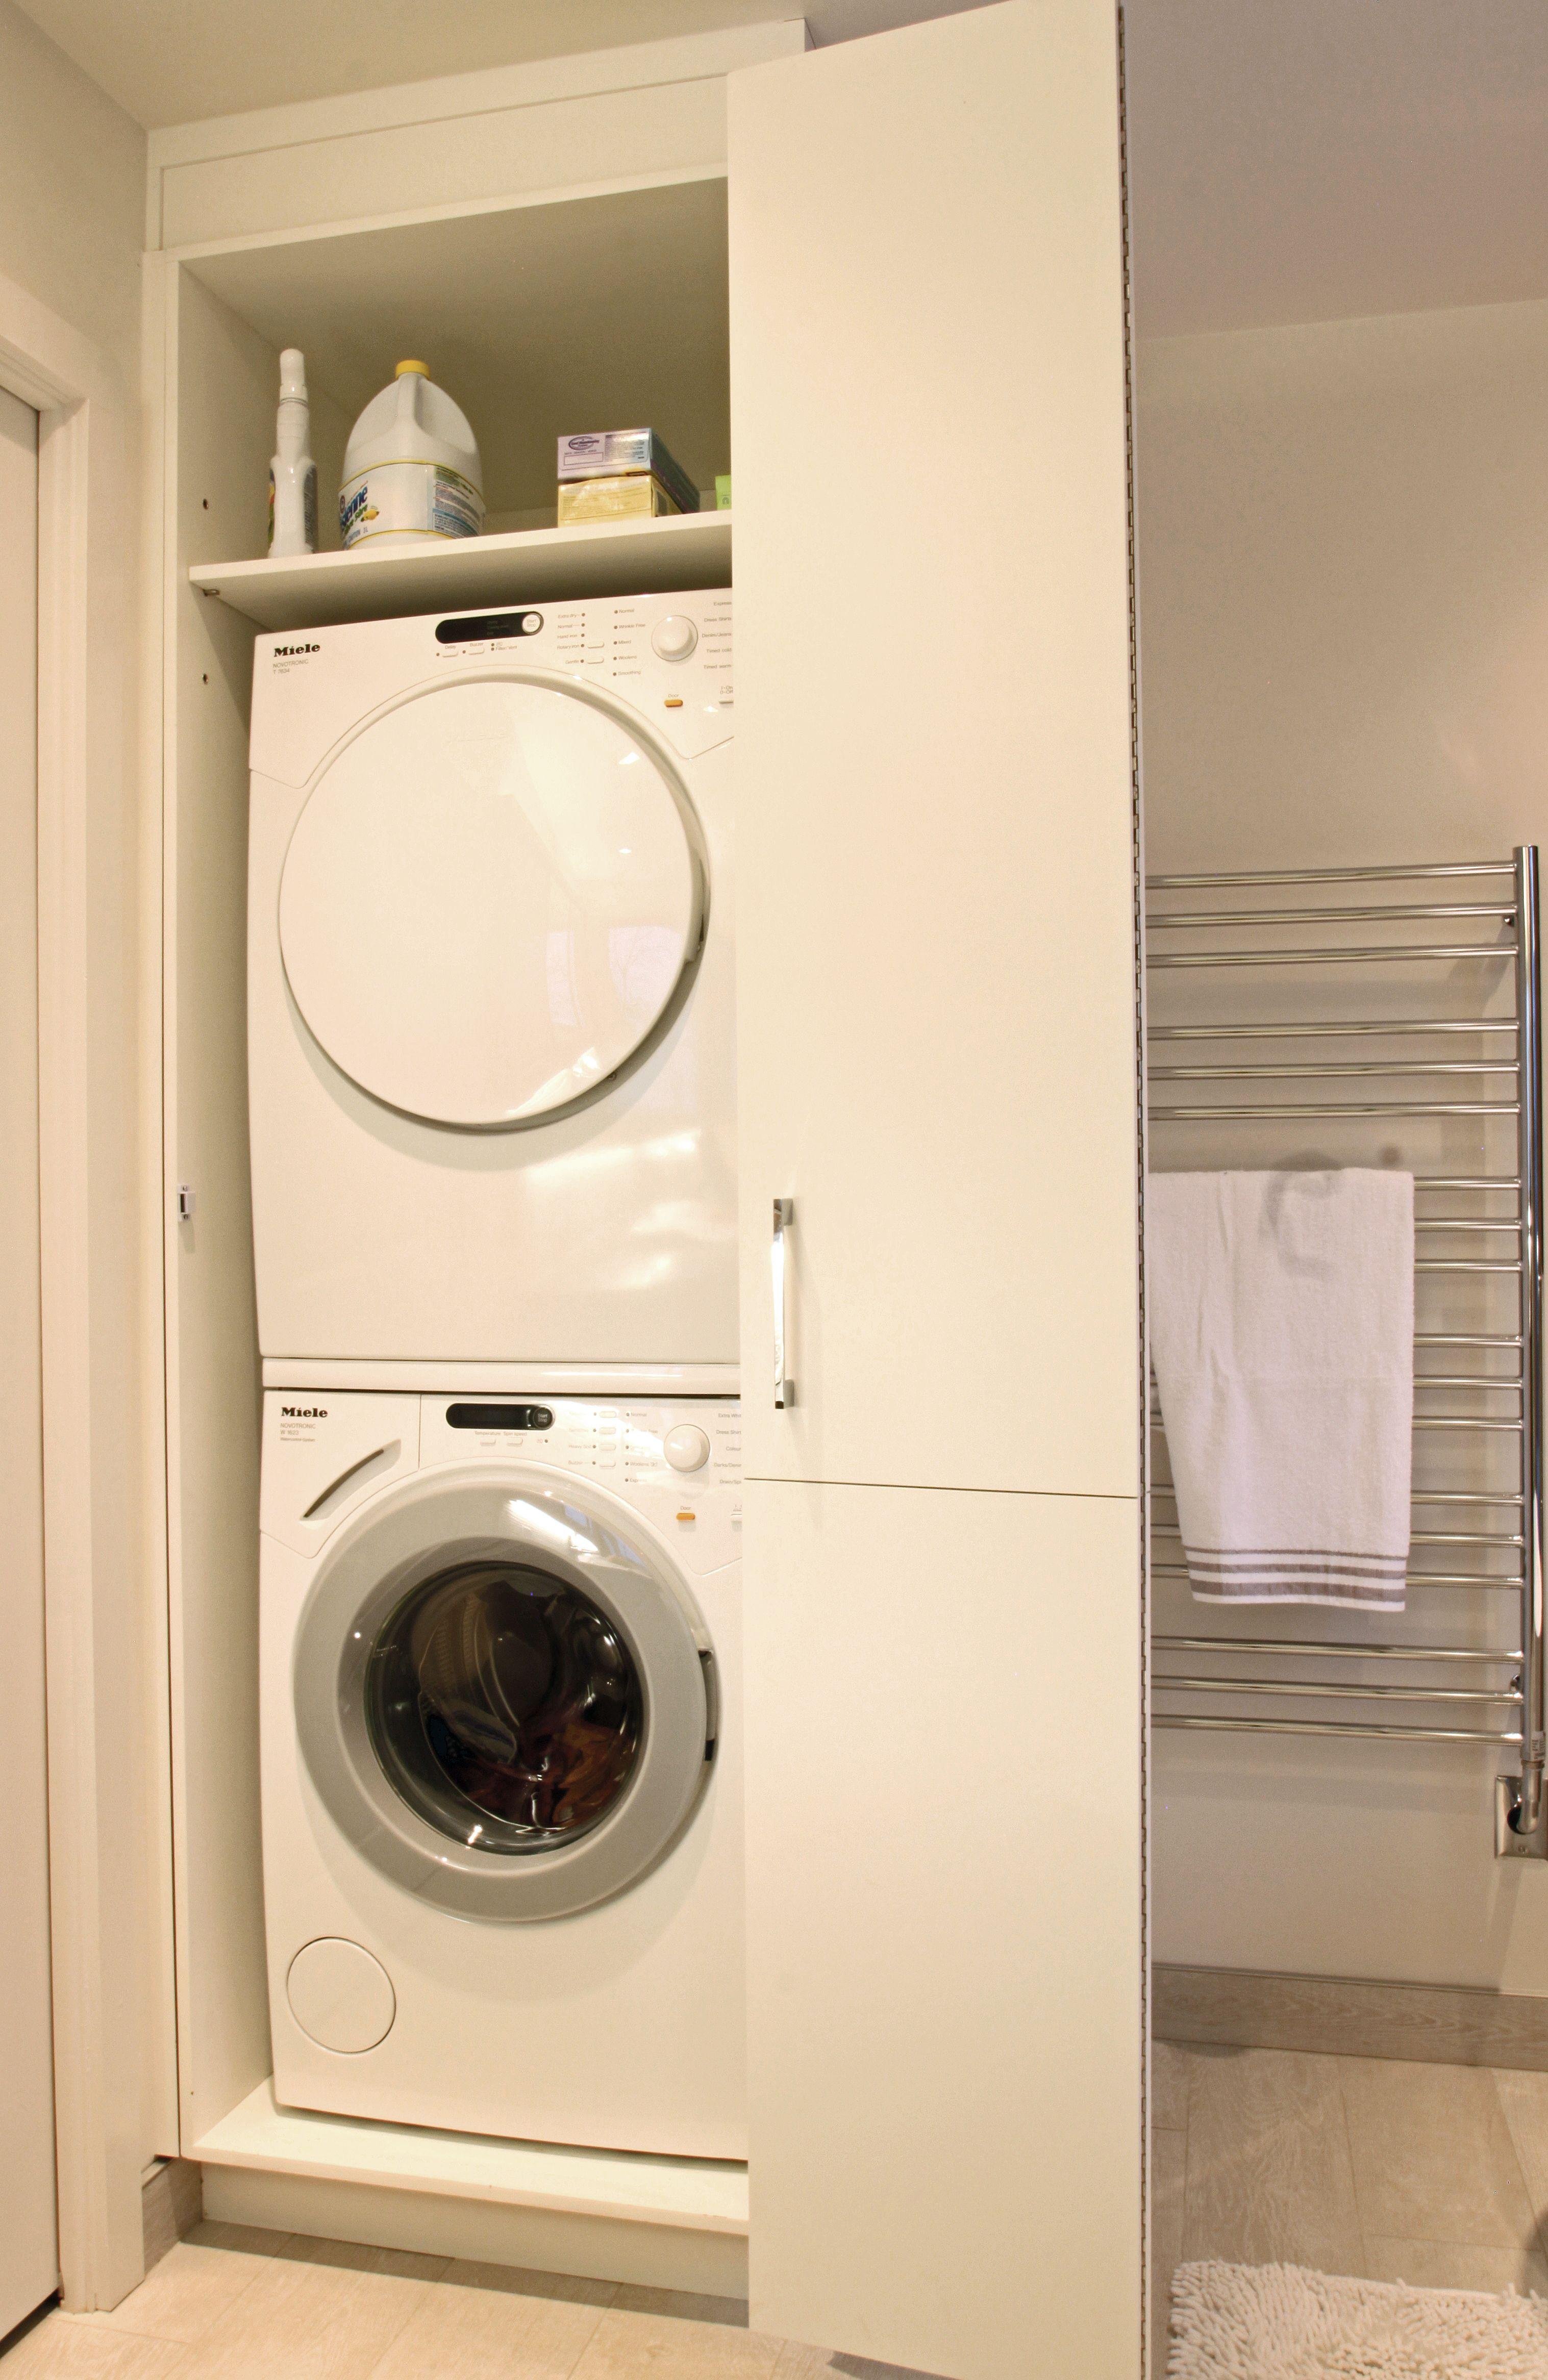 Rangement Laveuse Secheuse Salle De Bain Building A House Home Appliances Washer And Dryer